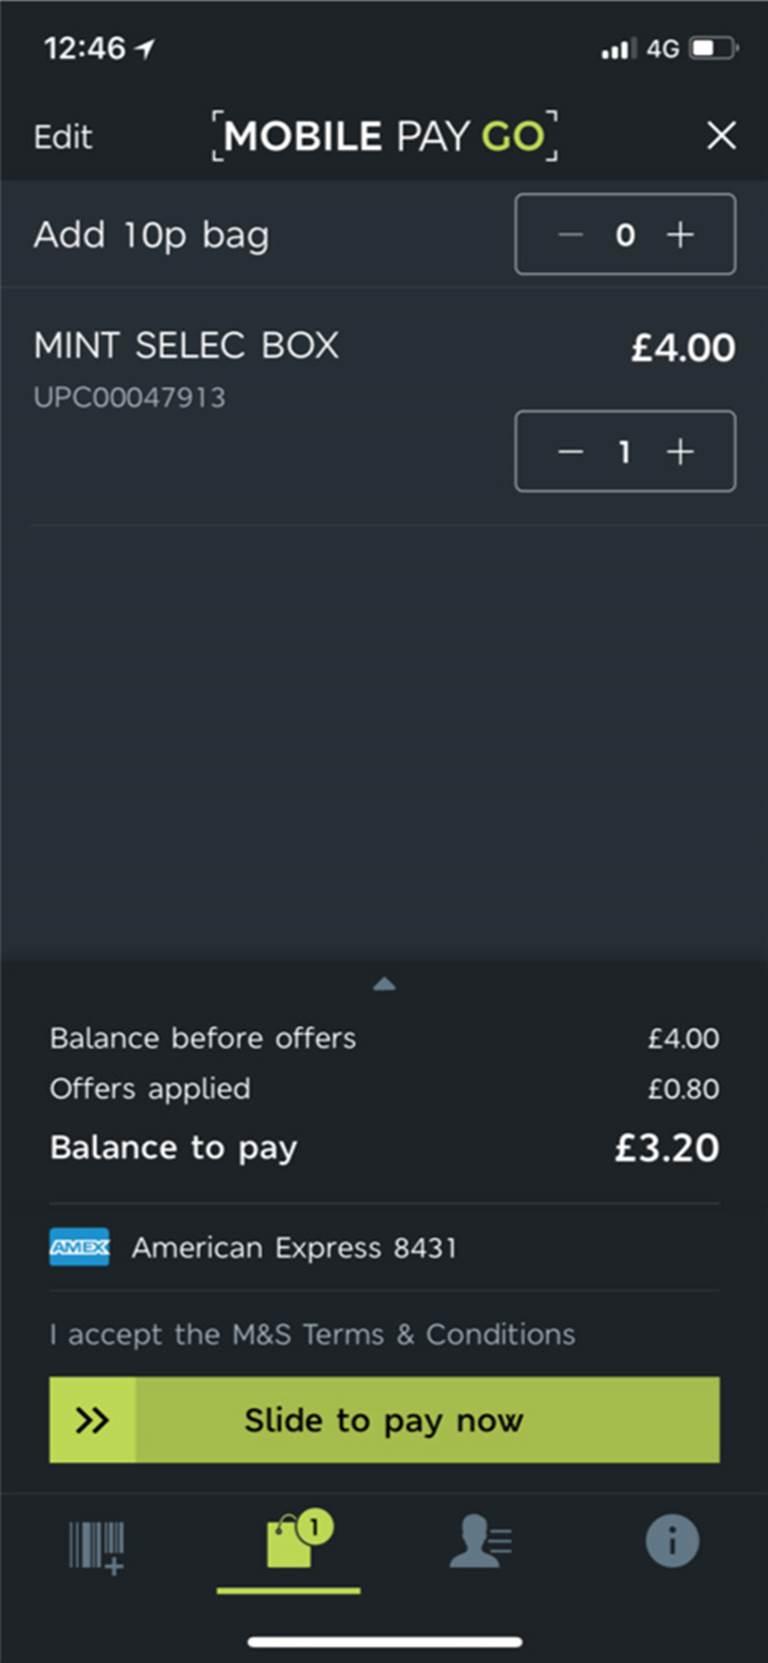 M&S Mobile Pay Go App Development